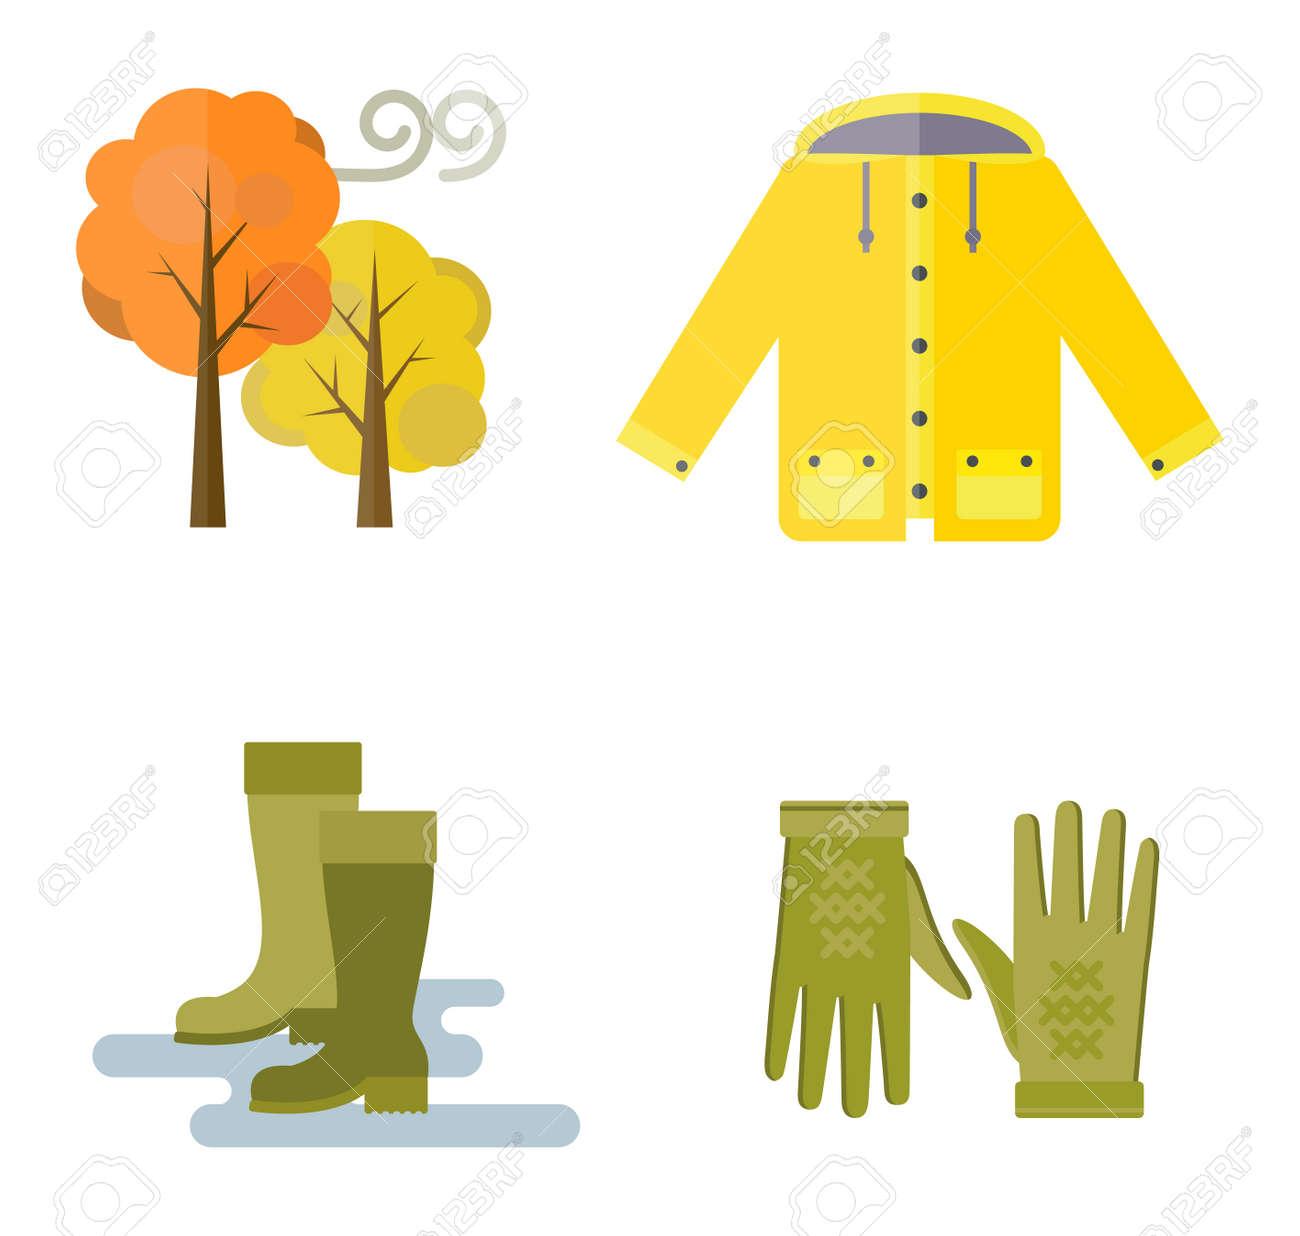 b5082d29d68c Collection of autumn clothes items. Clothes related to autumn and winter.  Clothes autumn